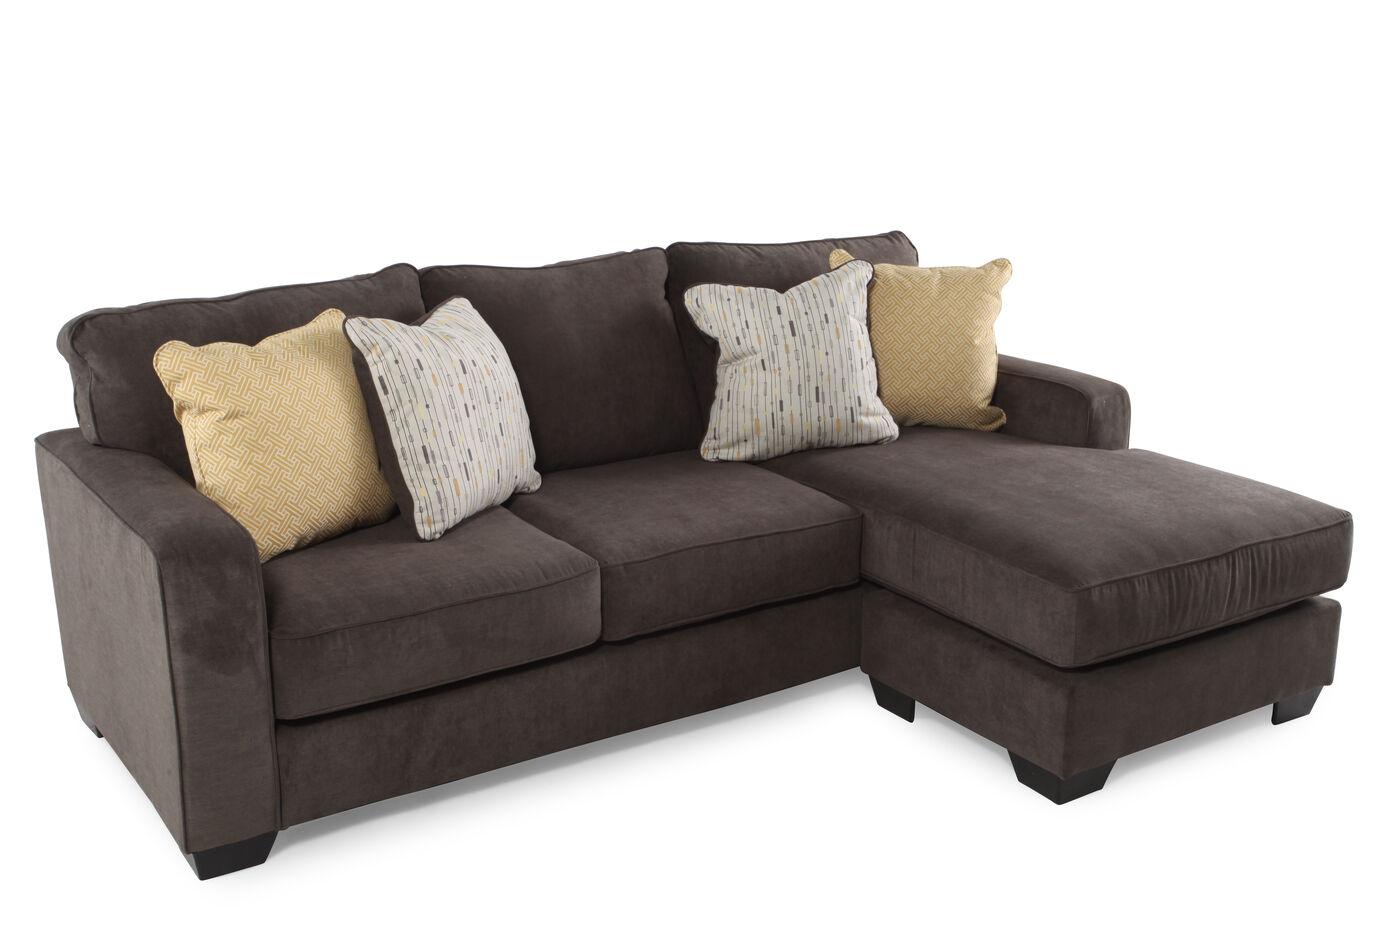 Hodan sofa chaise hodan marble sofa chaise signature for Ashley hodan sofa chaise